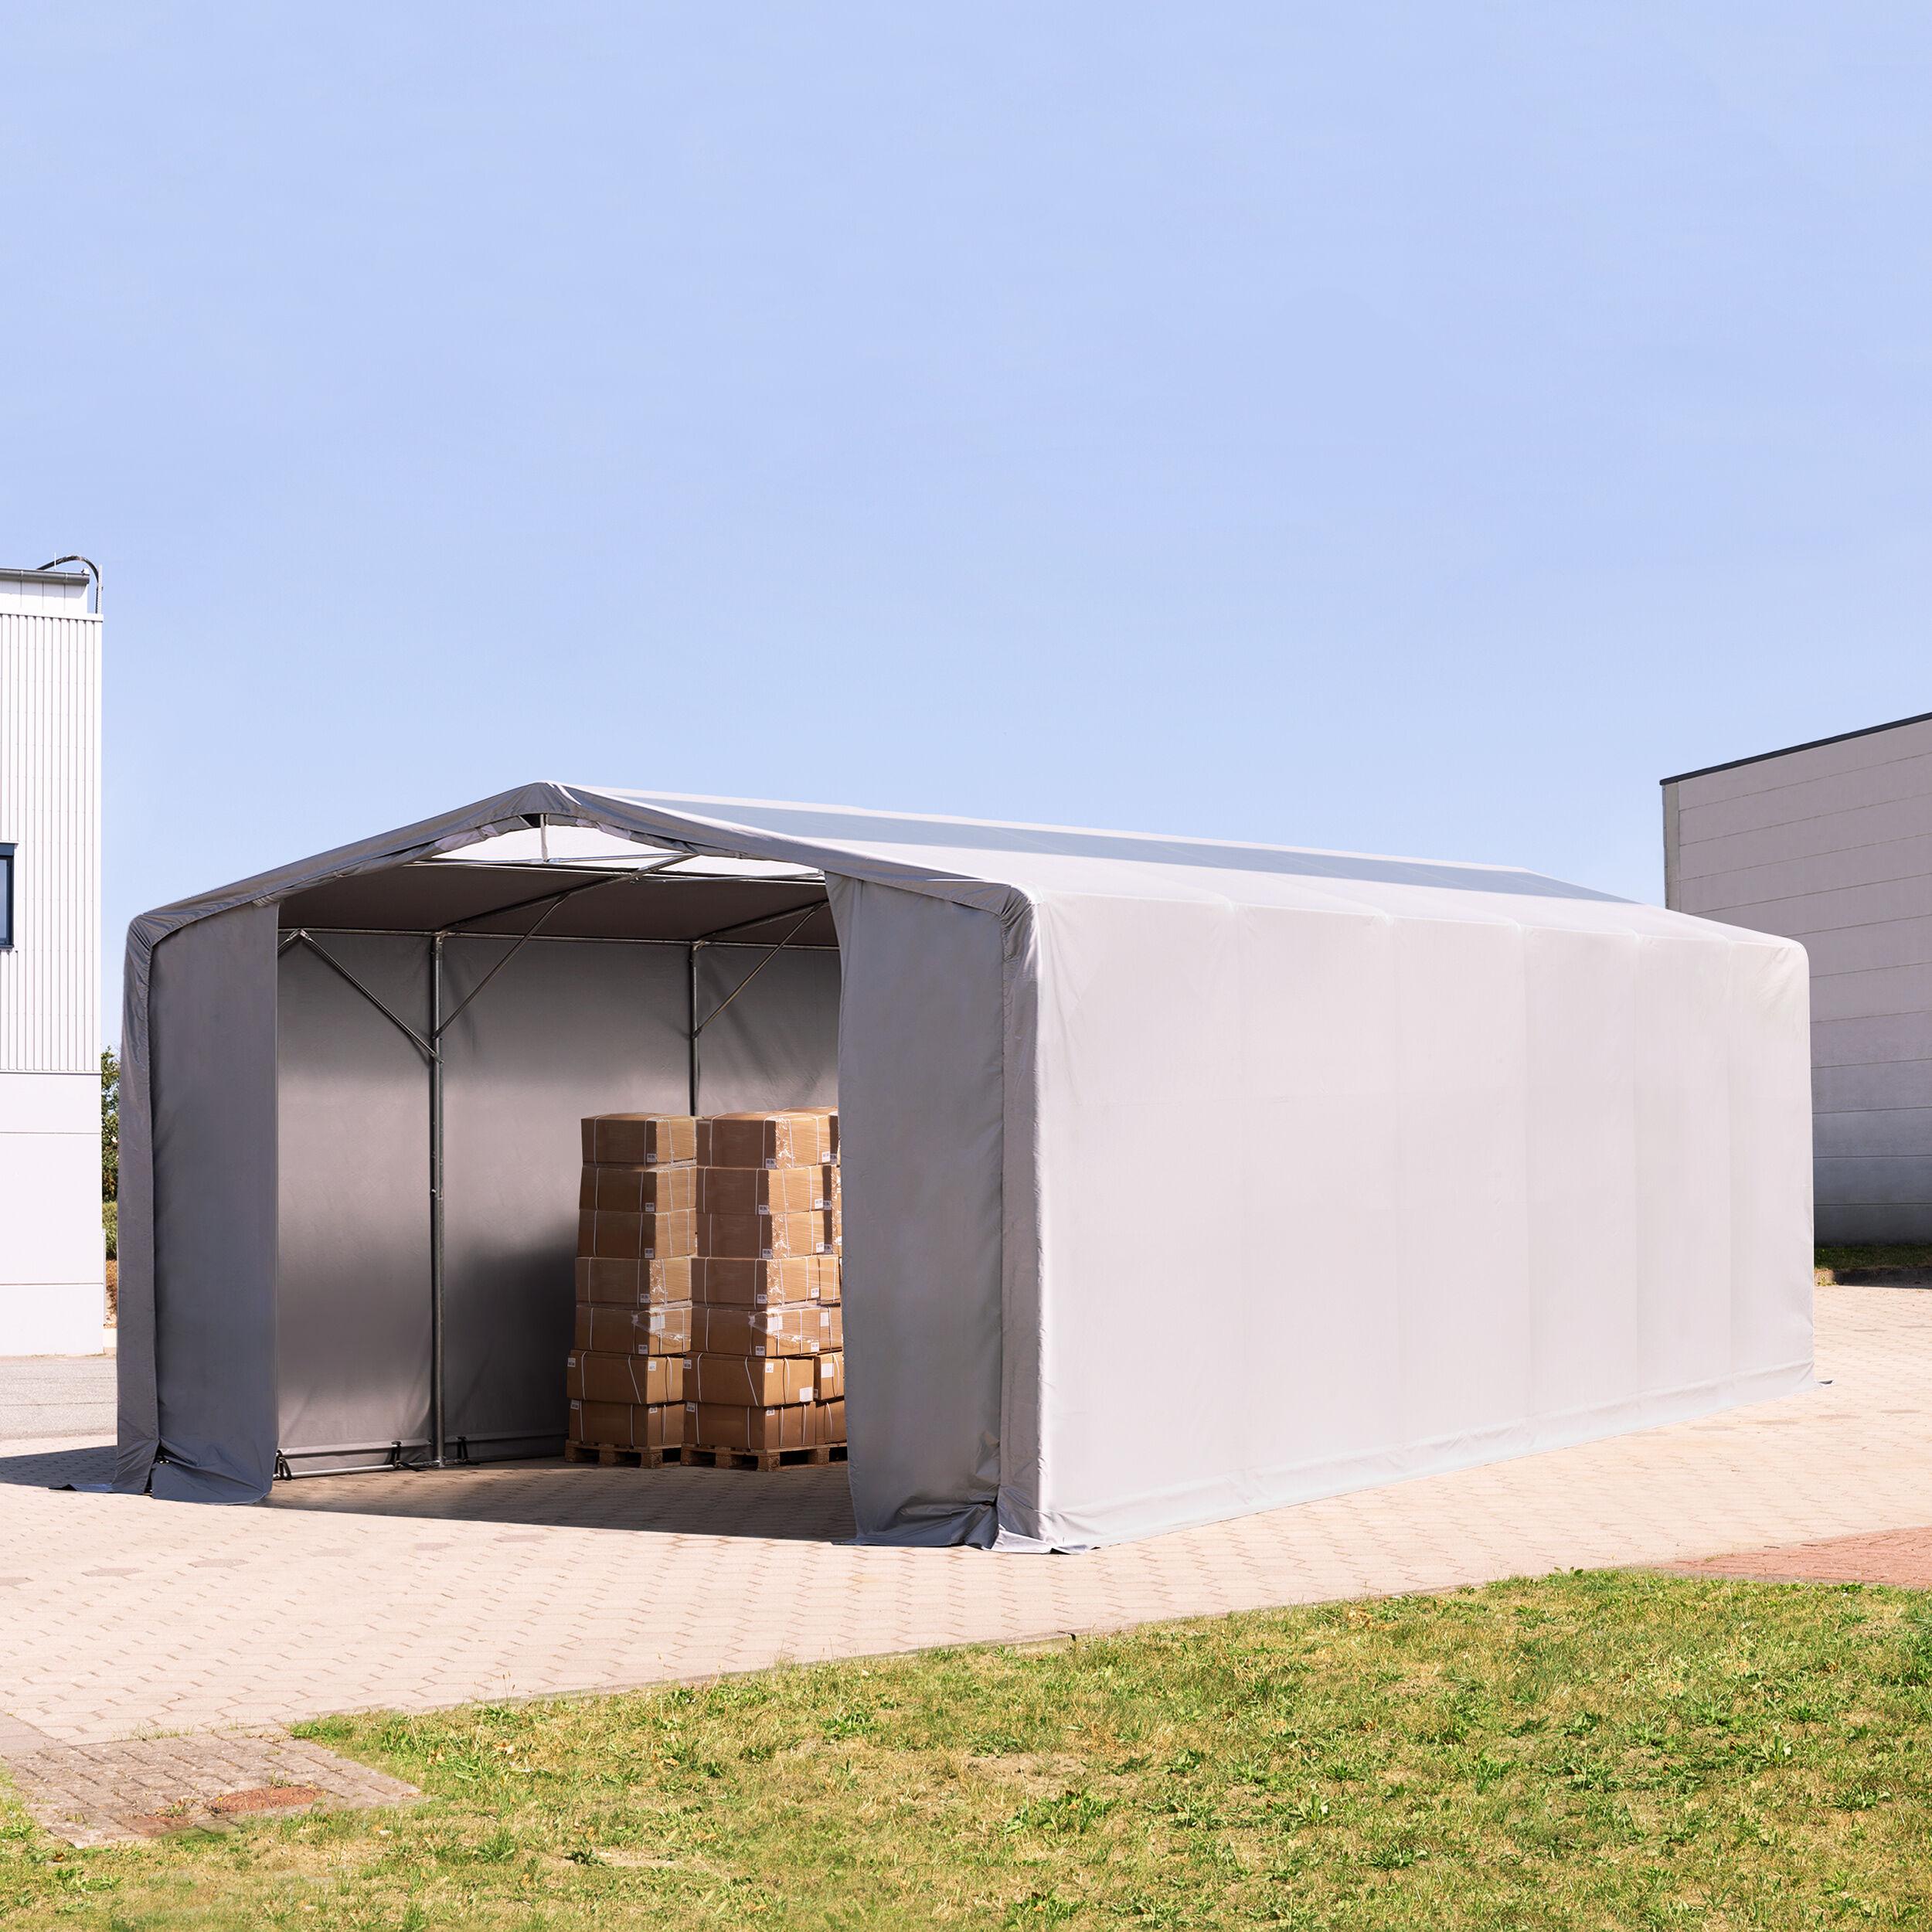 TOOLPORT Industrial Tent 8x12m PVC 550 g/m² grey waterproof